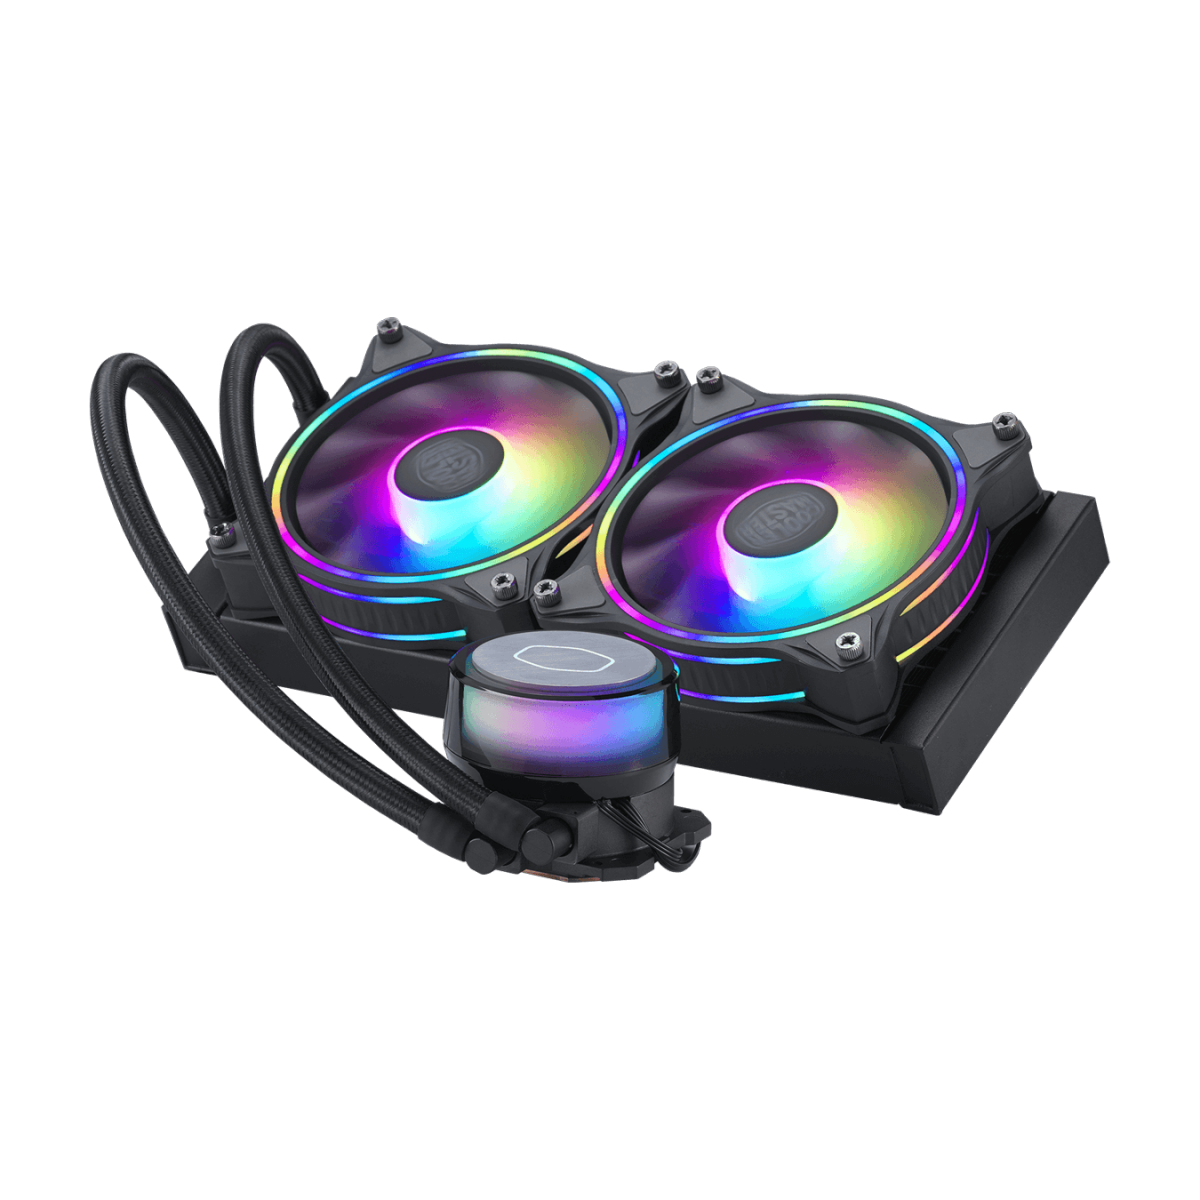 Water Cooler, Cooler Master Master Liquid ML240 ILLUSION, RGB, 240mm, Intel-AMD, MLX-D24M-A18P2-R1